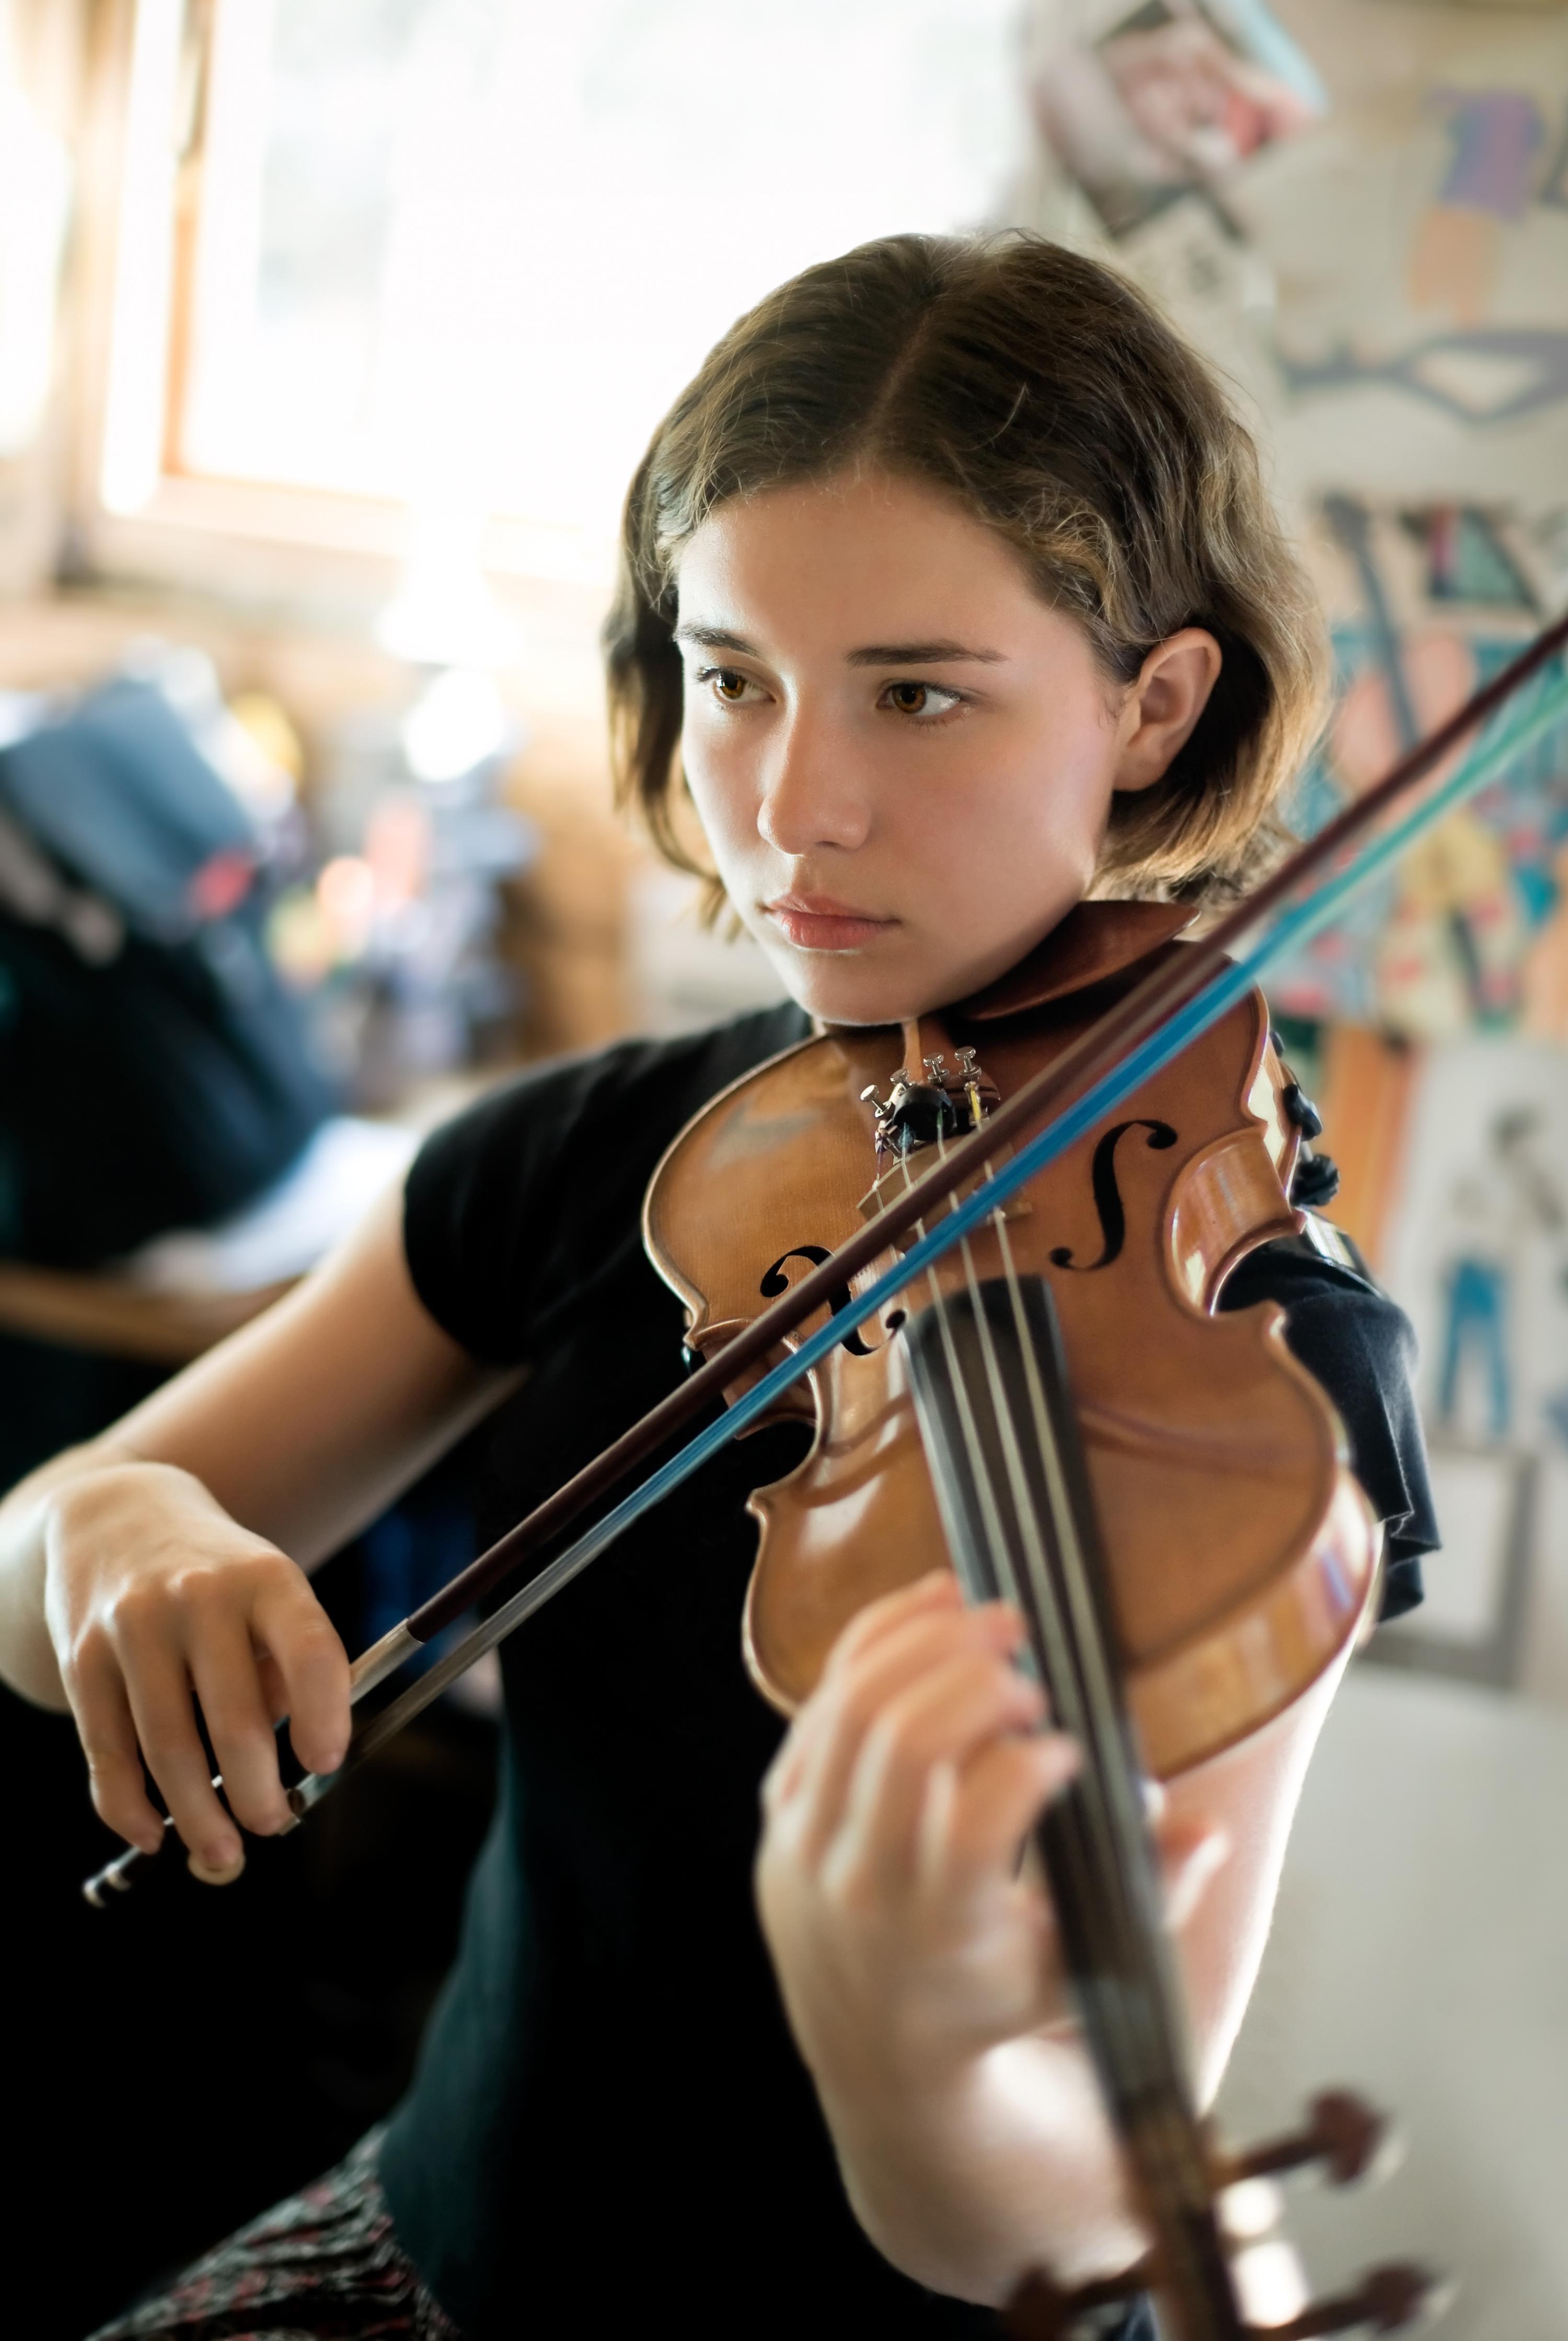 Girl Practicing Violin